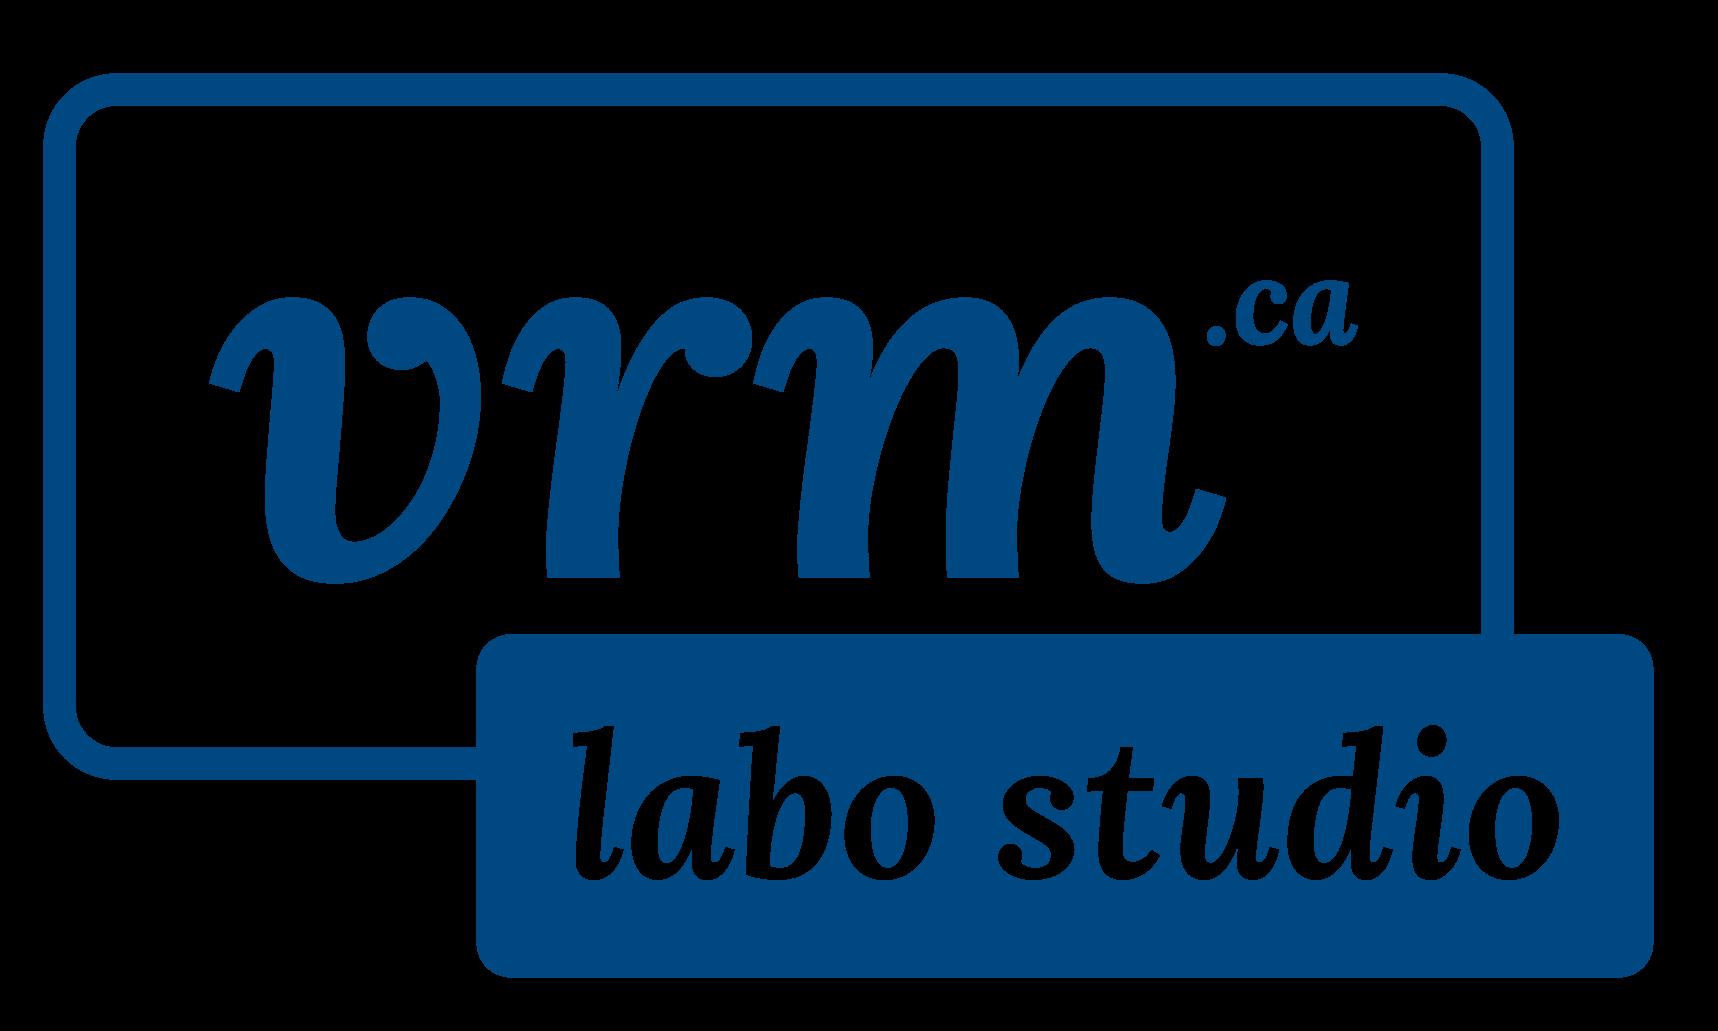 Labo studio VRM